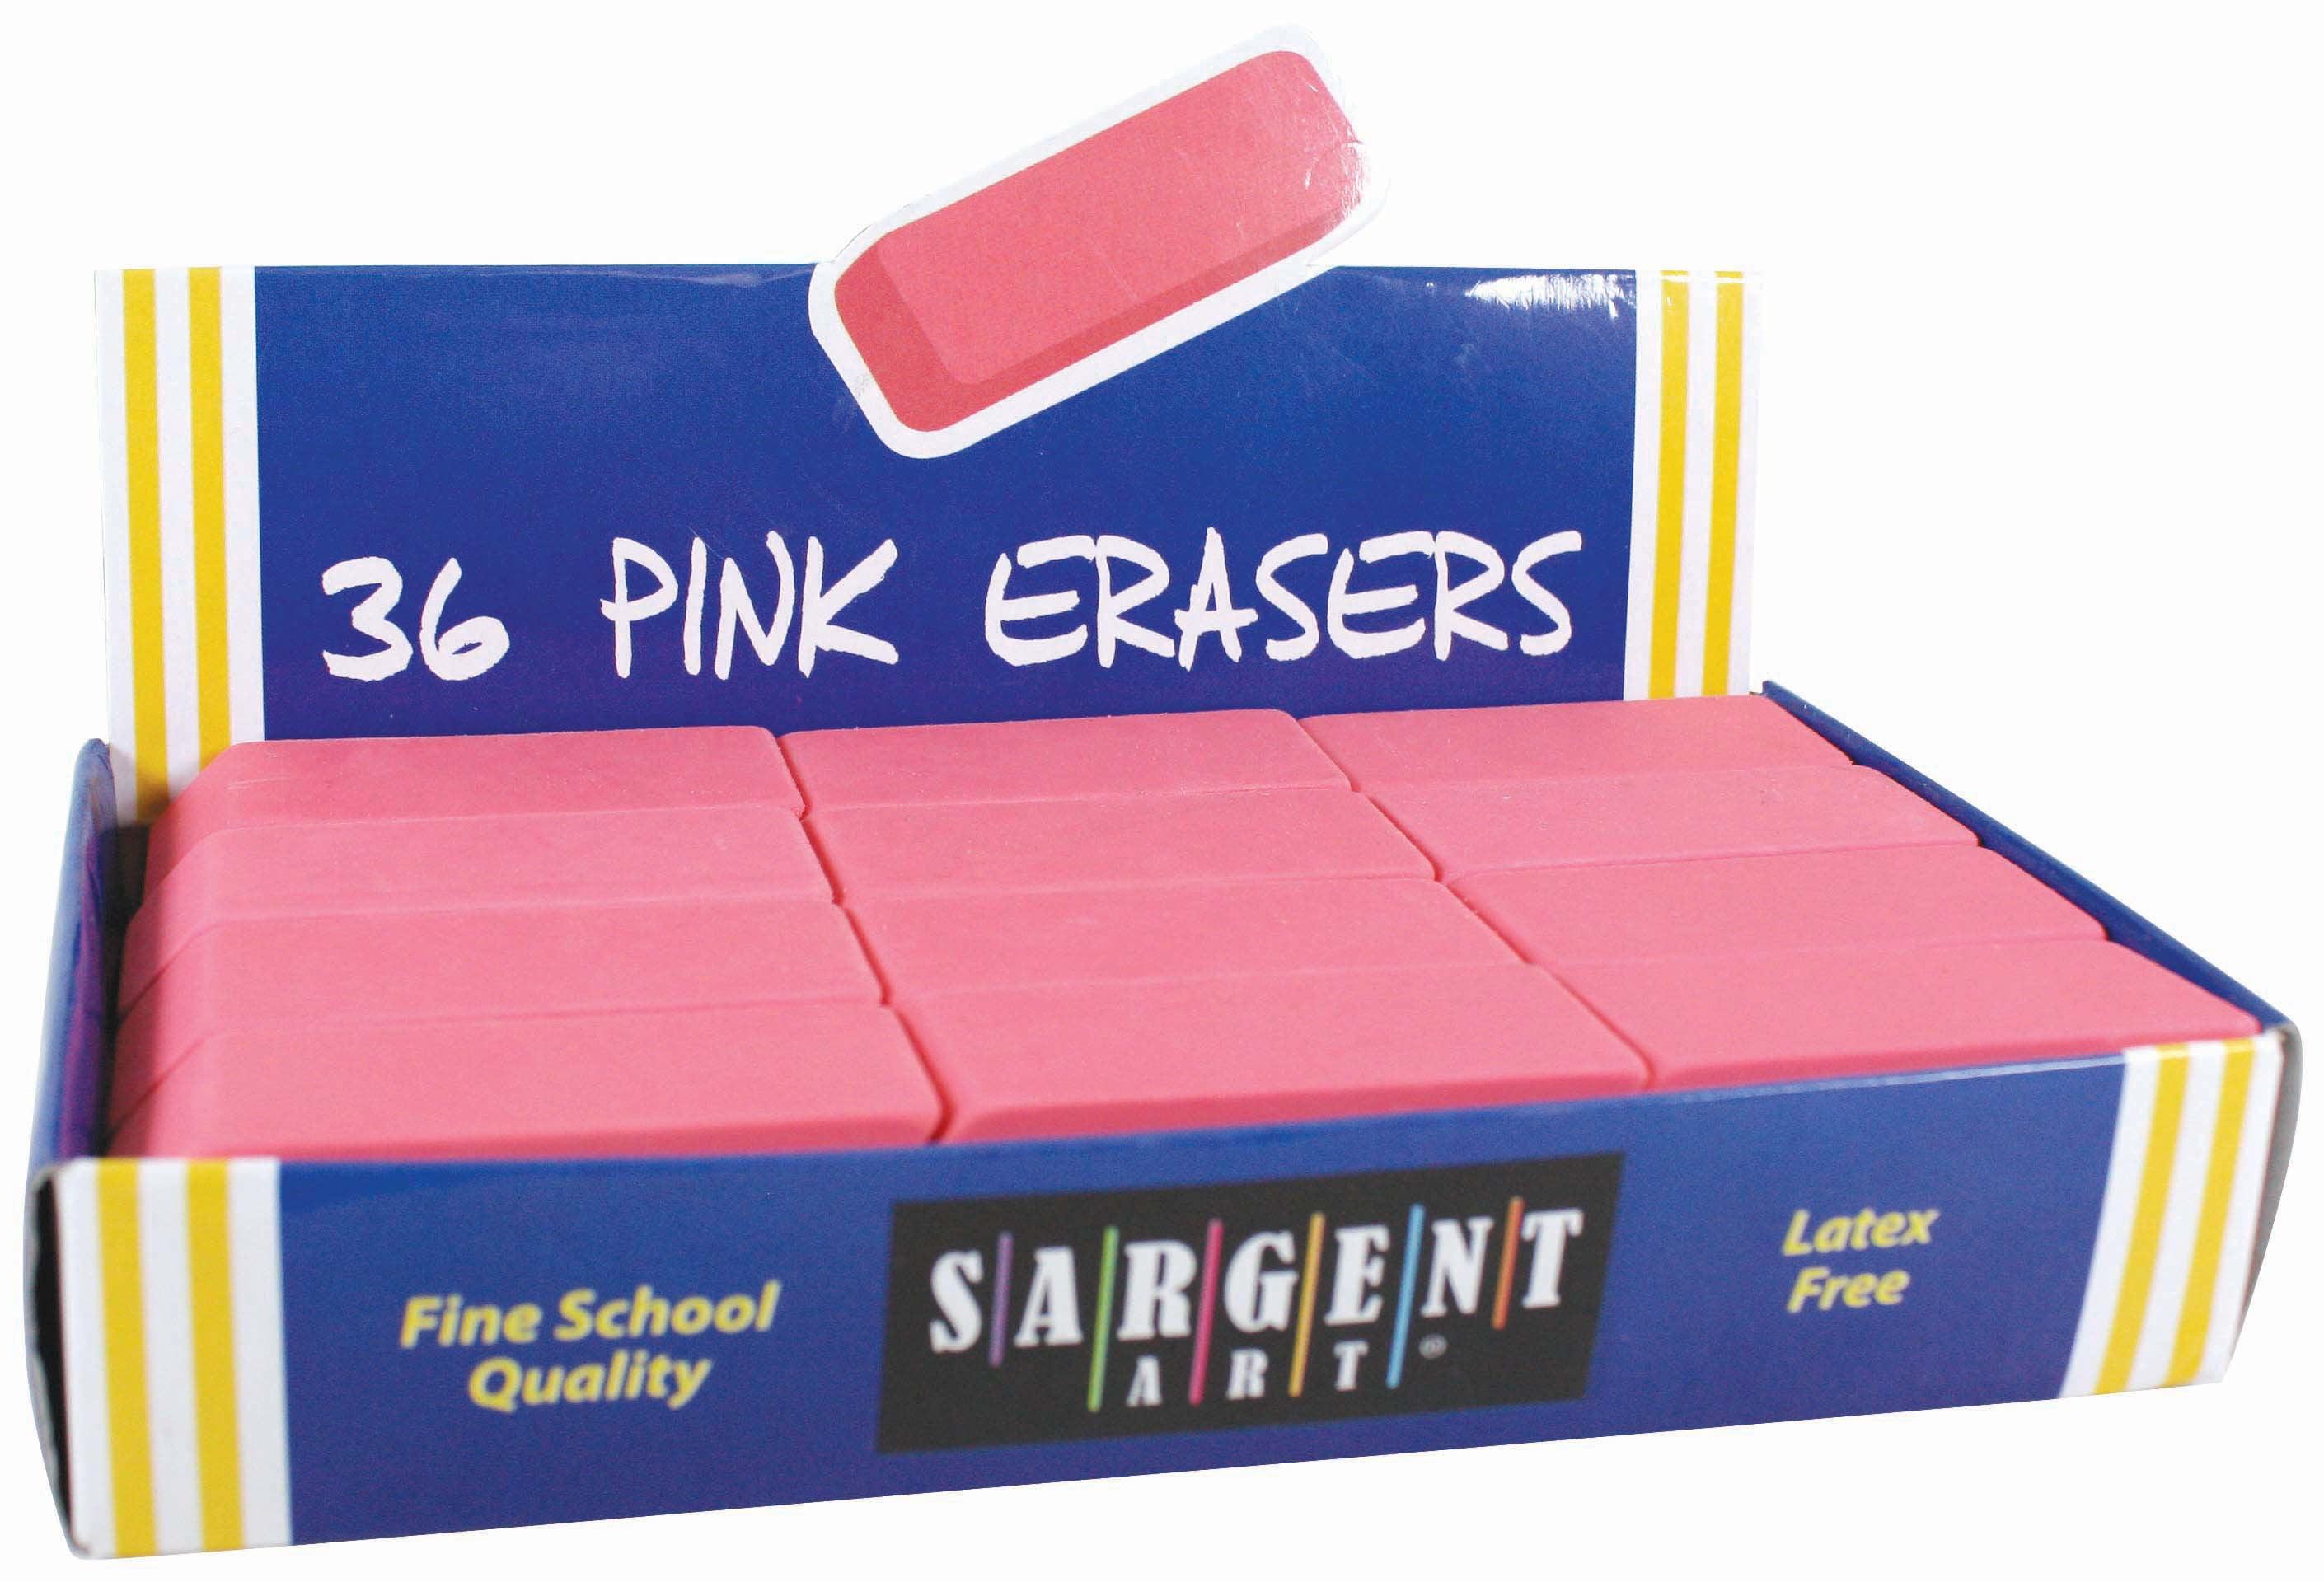 Sargent Art Large Pink Erasers, 36-Count (36-1012) by Sargent Art